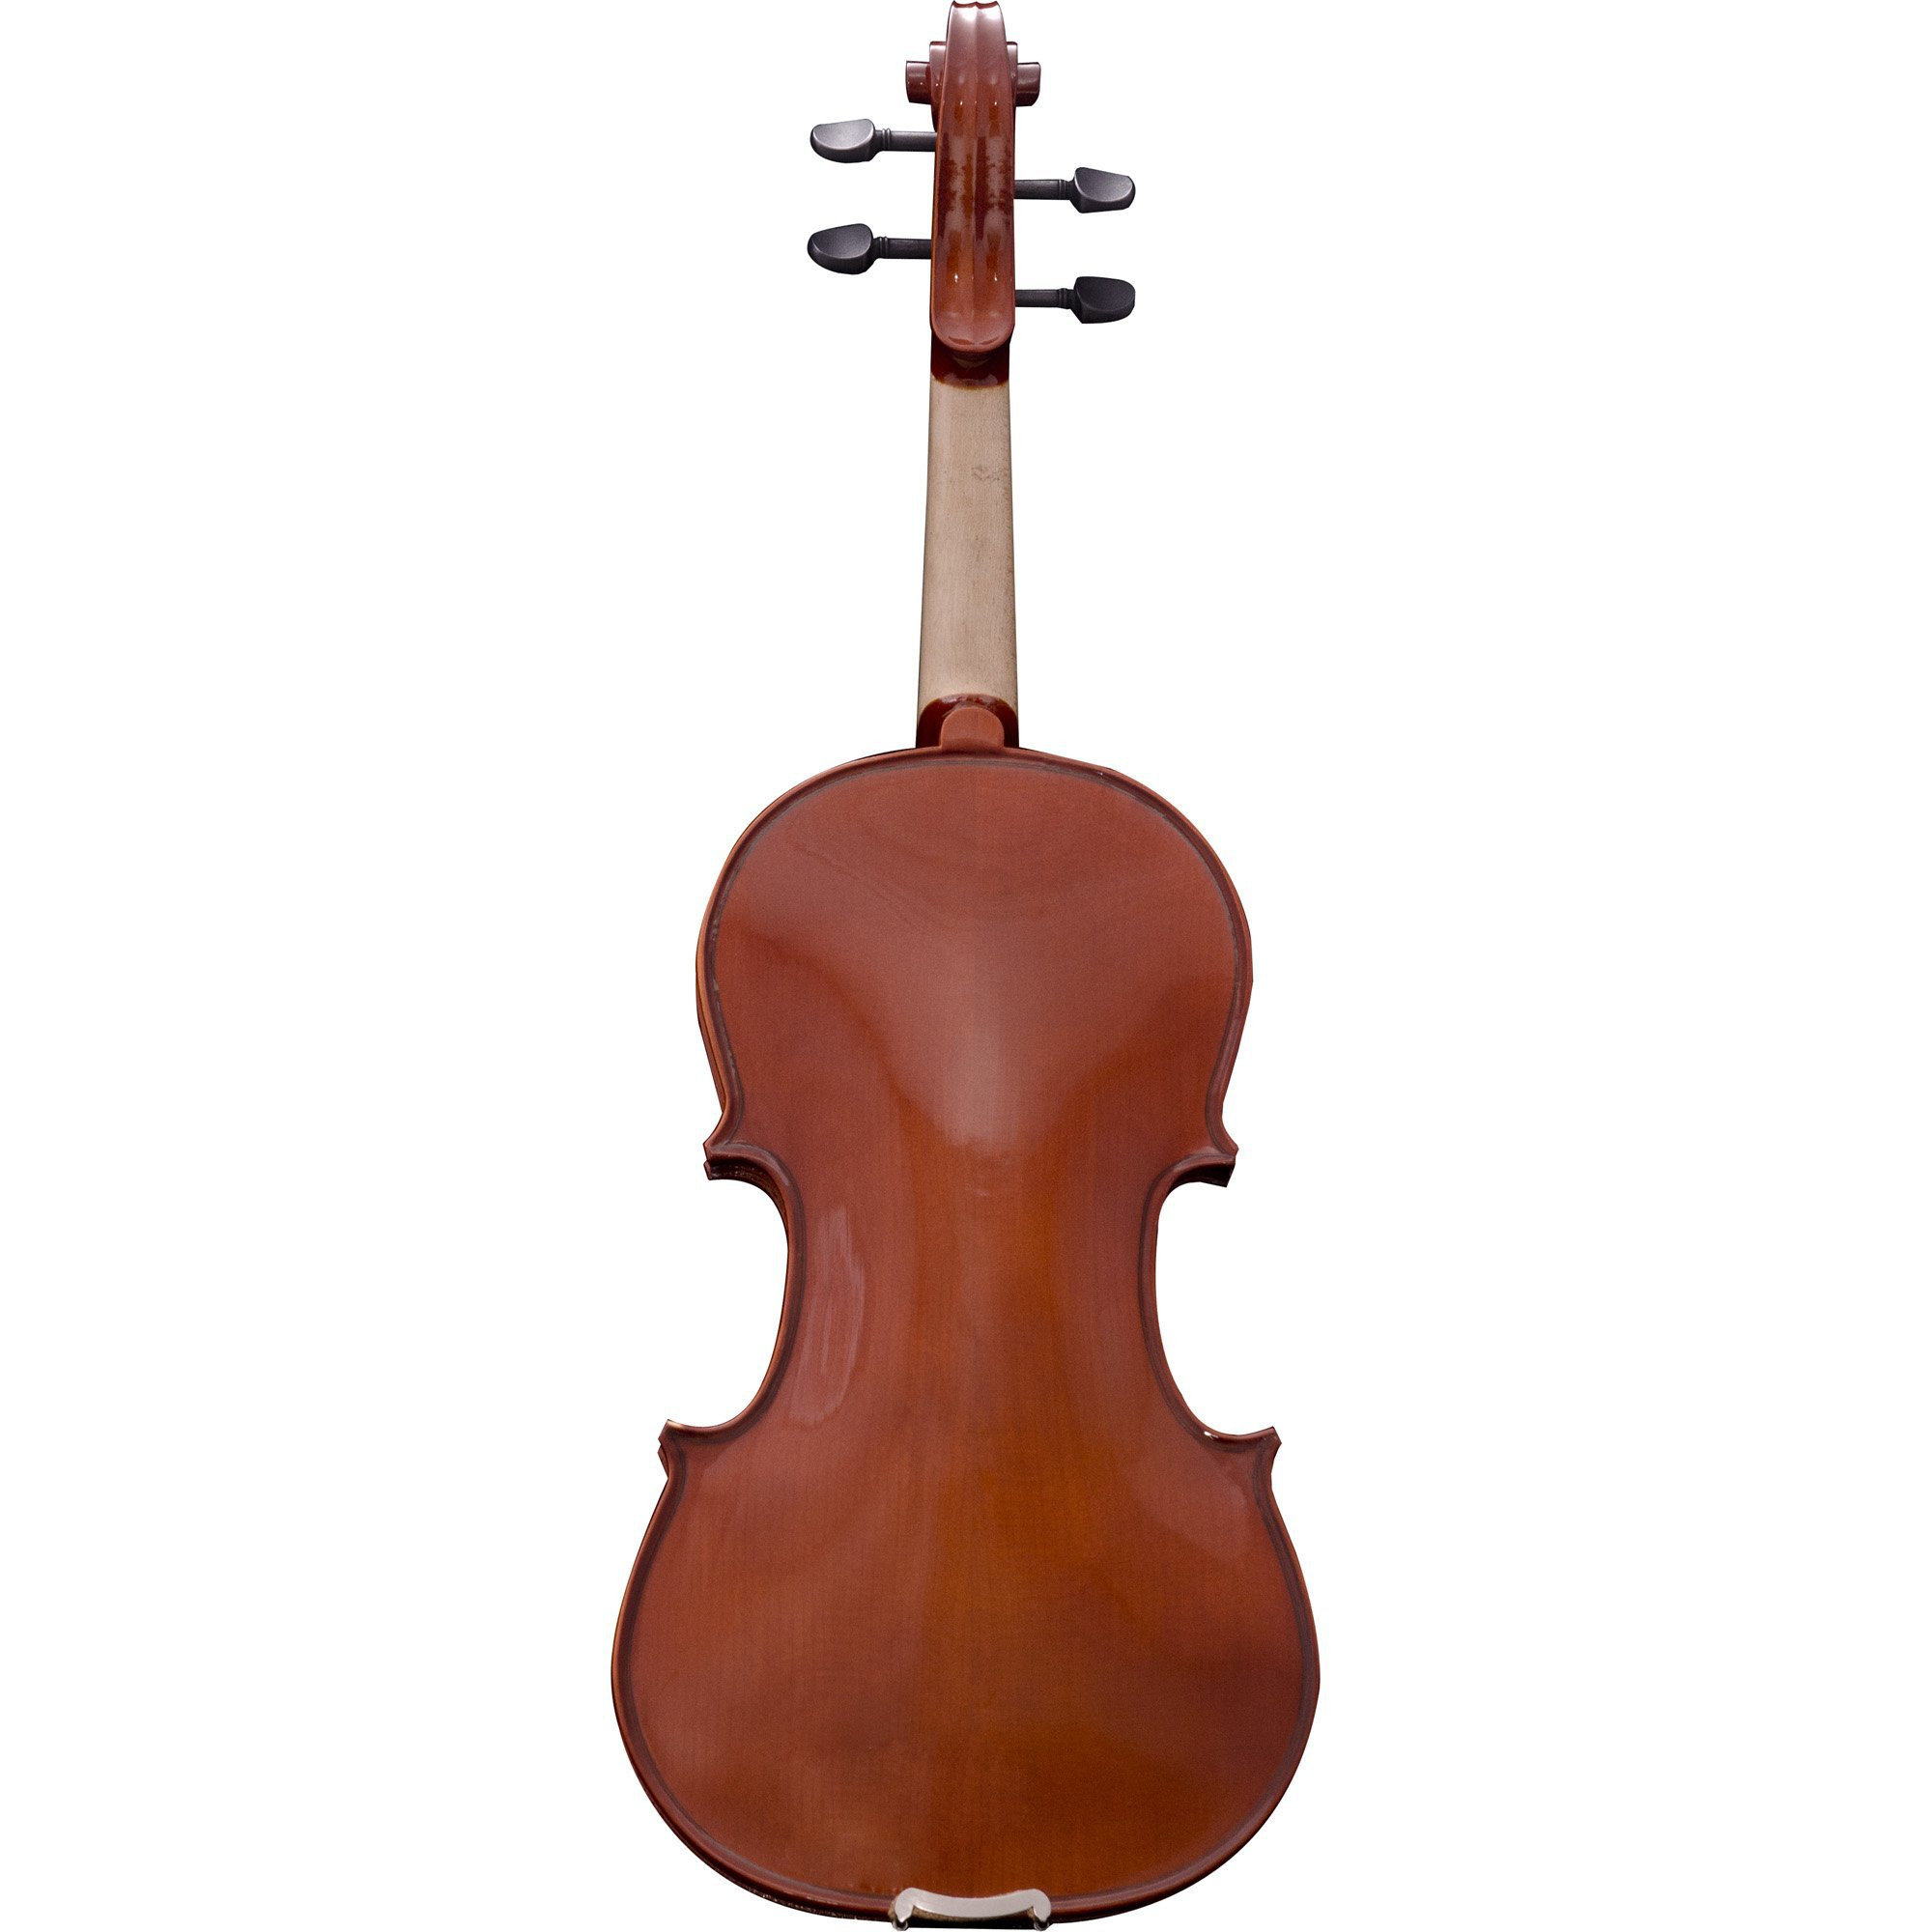 violino 4 4 va 10 oportunidade natural harmonics 42888 2000 181308